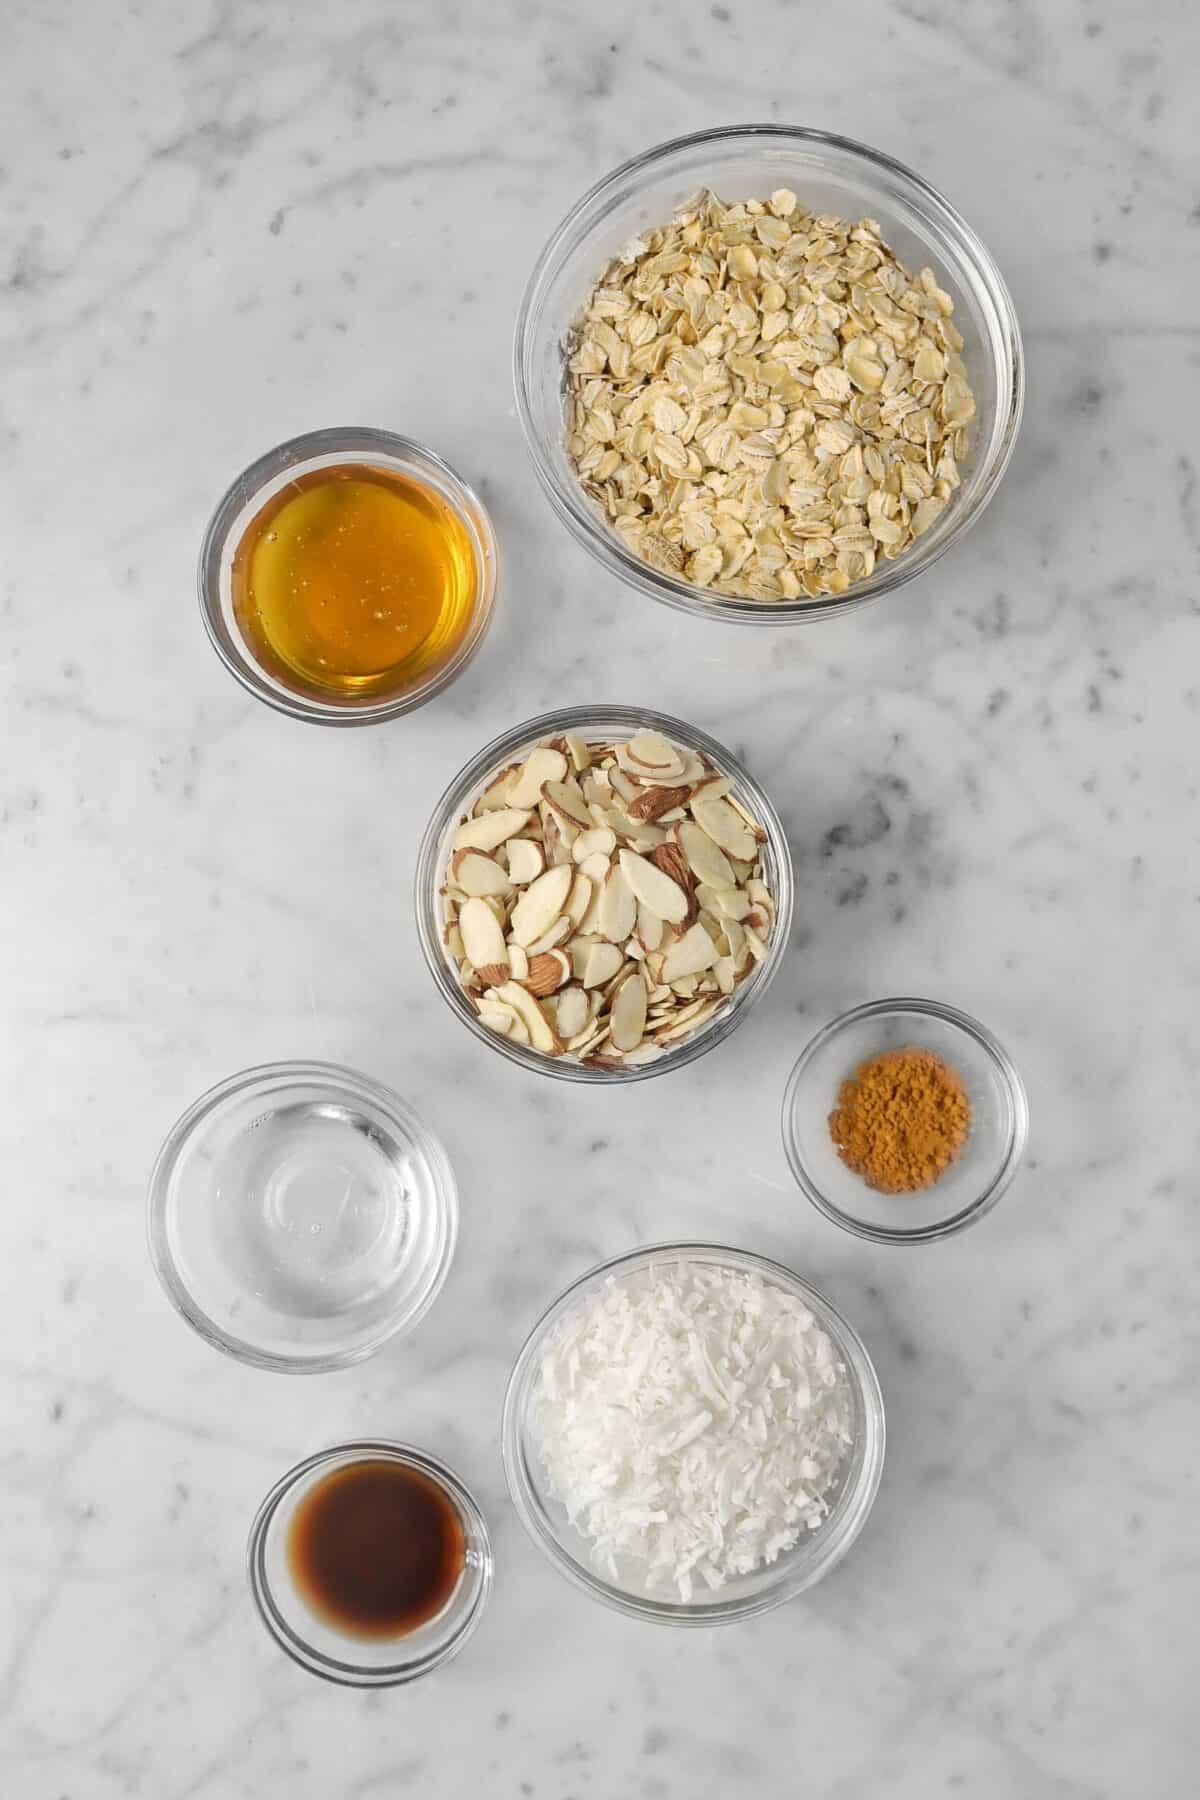 oatmeal, honey, almonds, cinnamon, coconut, vanilla, and coconut oil in glass bowls